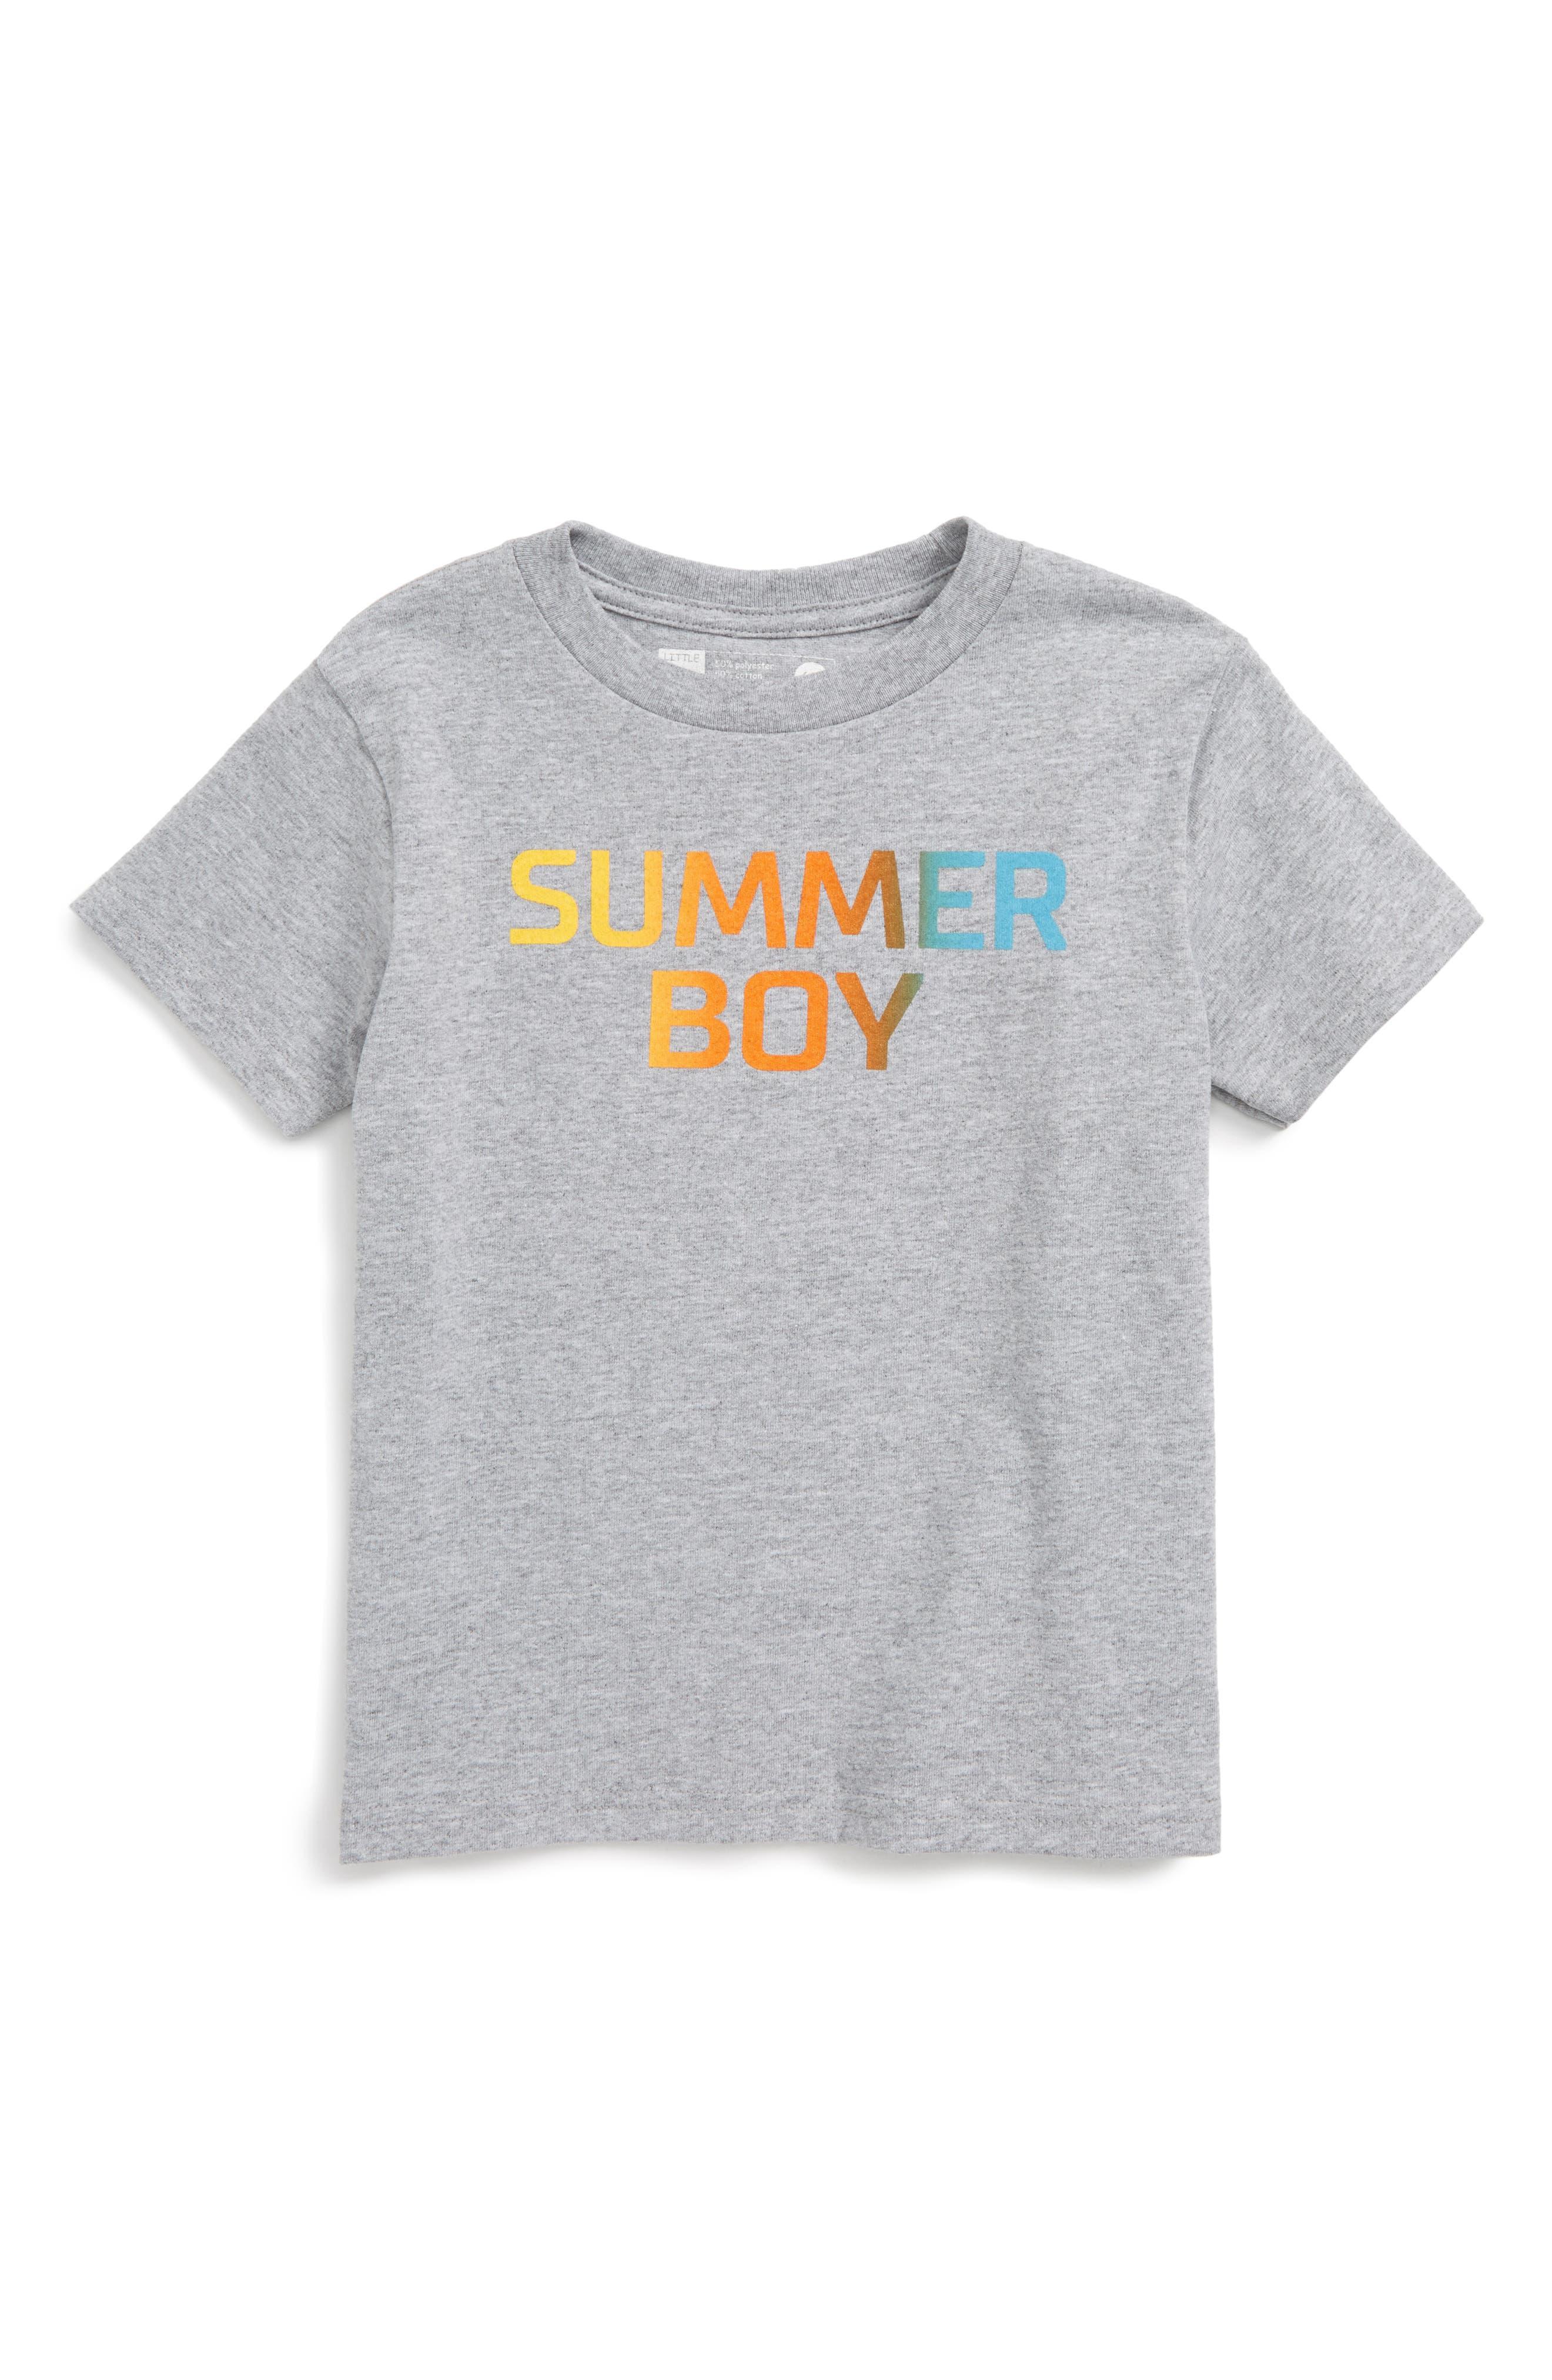 Summer Boy Graphic T-Shirt,                             Main thumbnail 1, color,                             020